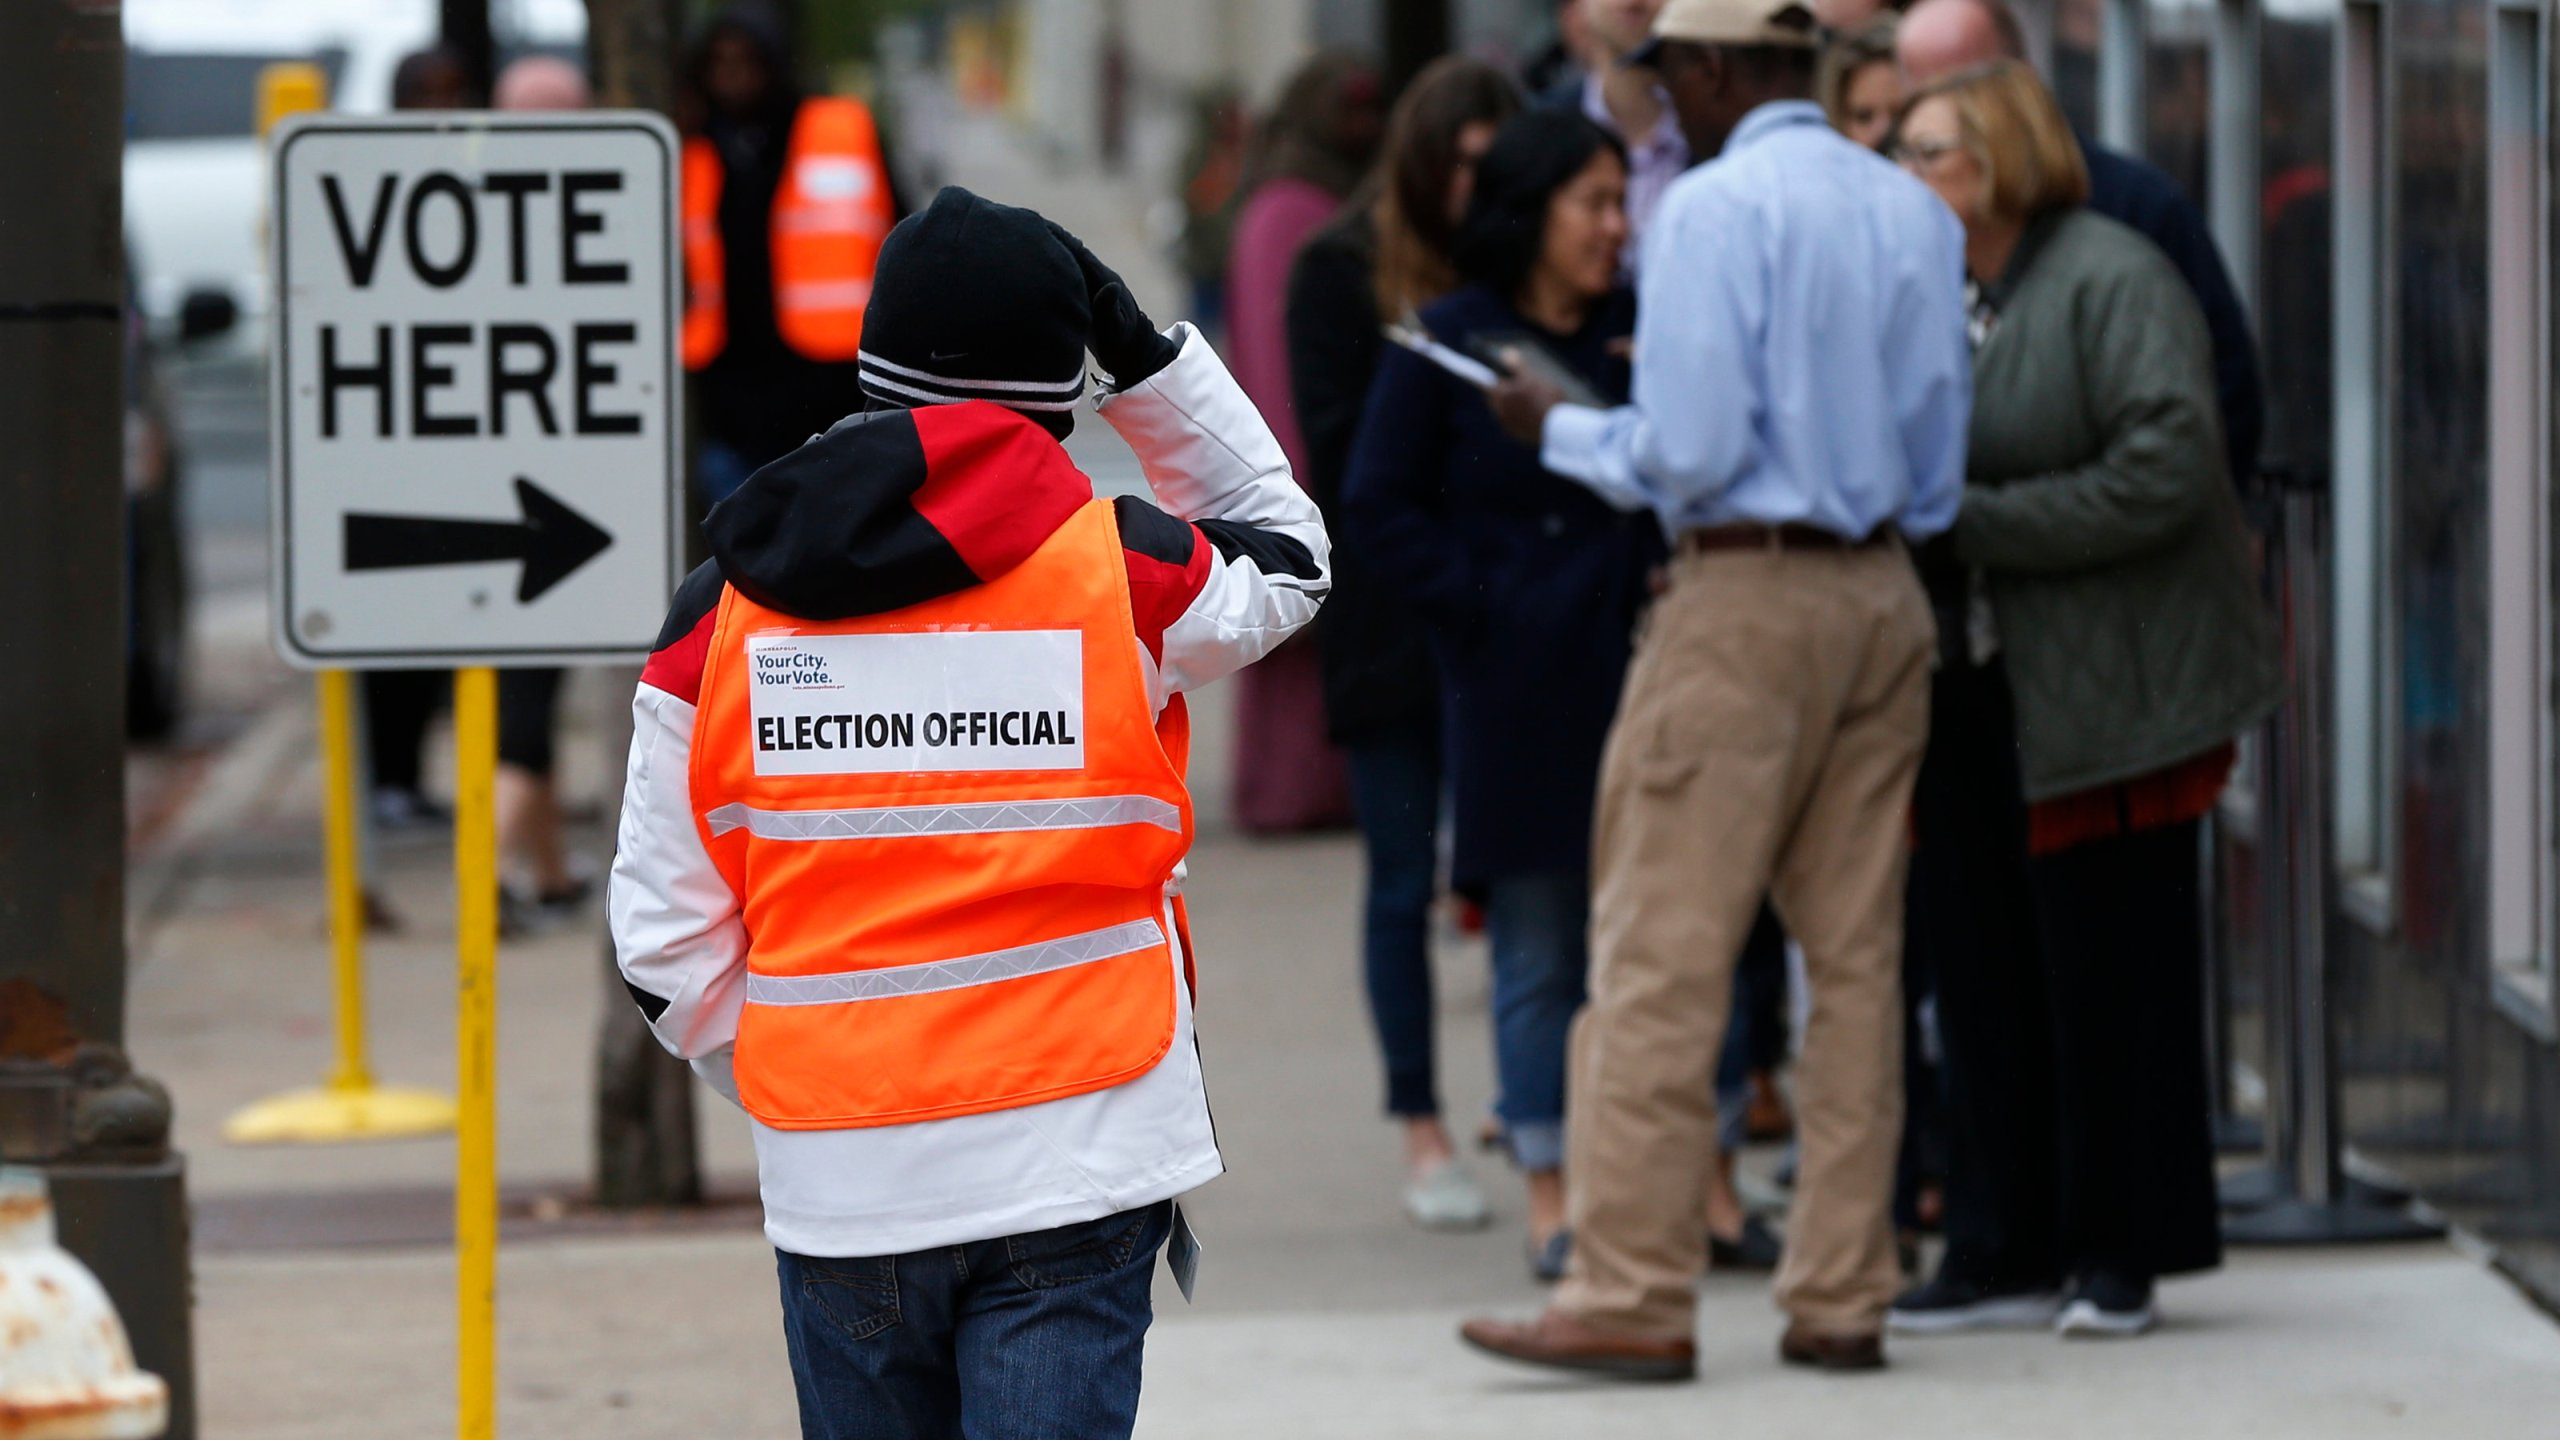 Election_2018_VoteCast_90066-159532.jpg43293009